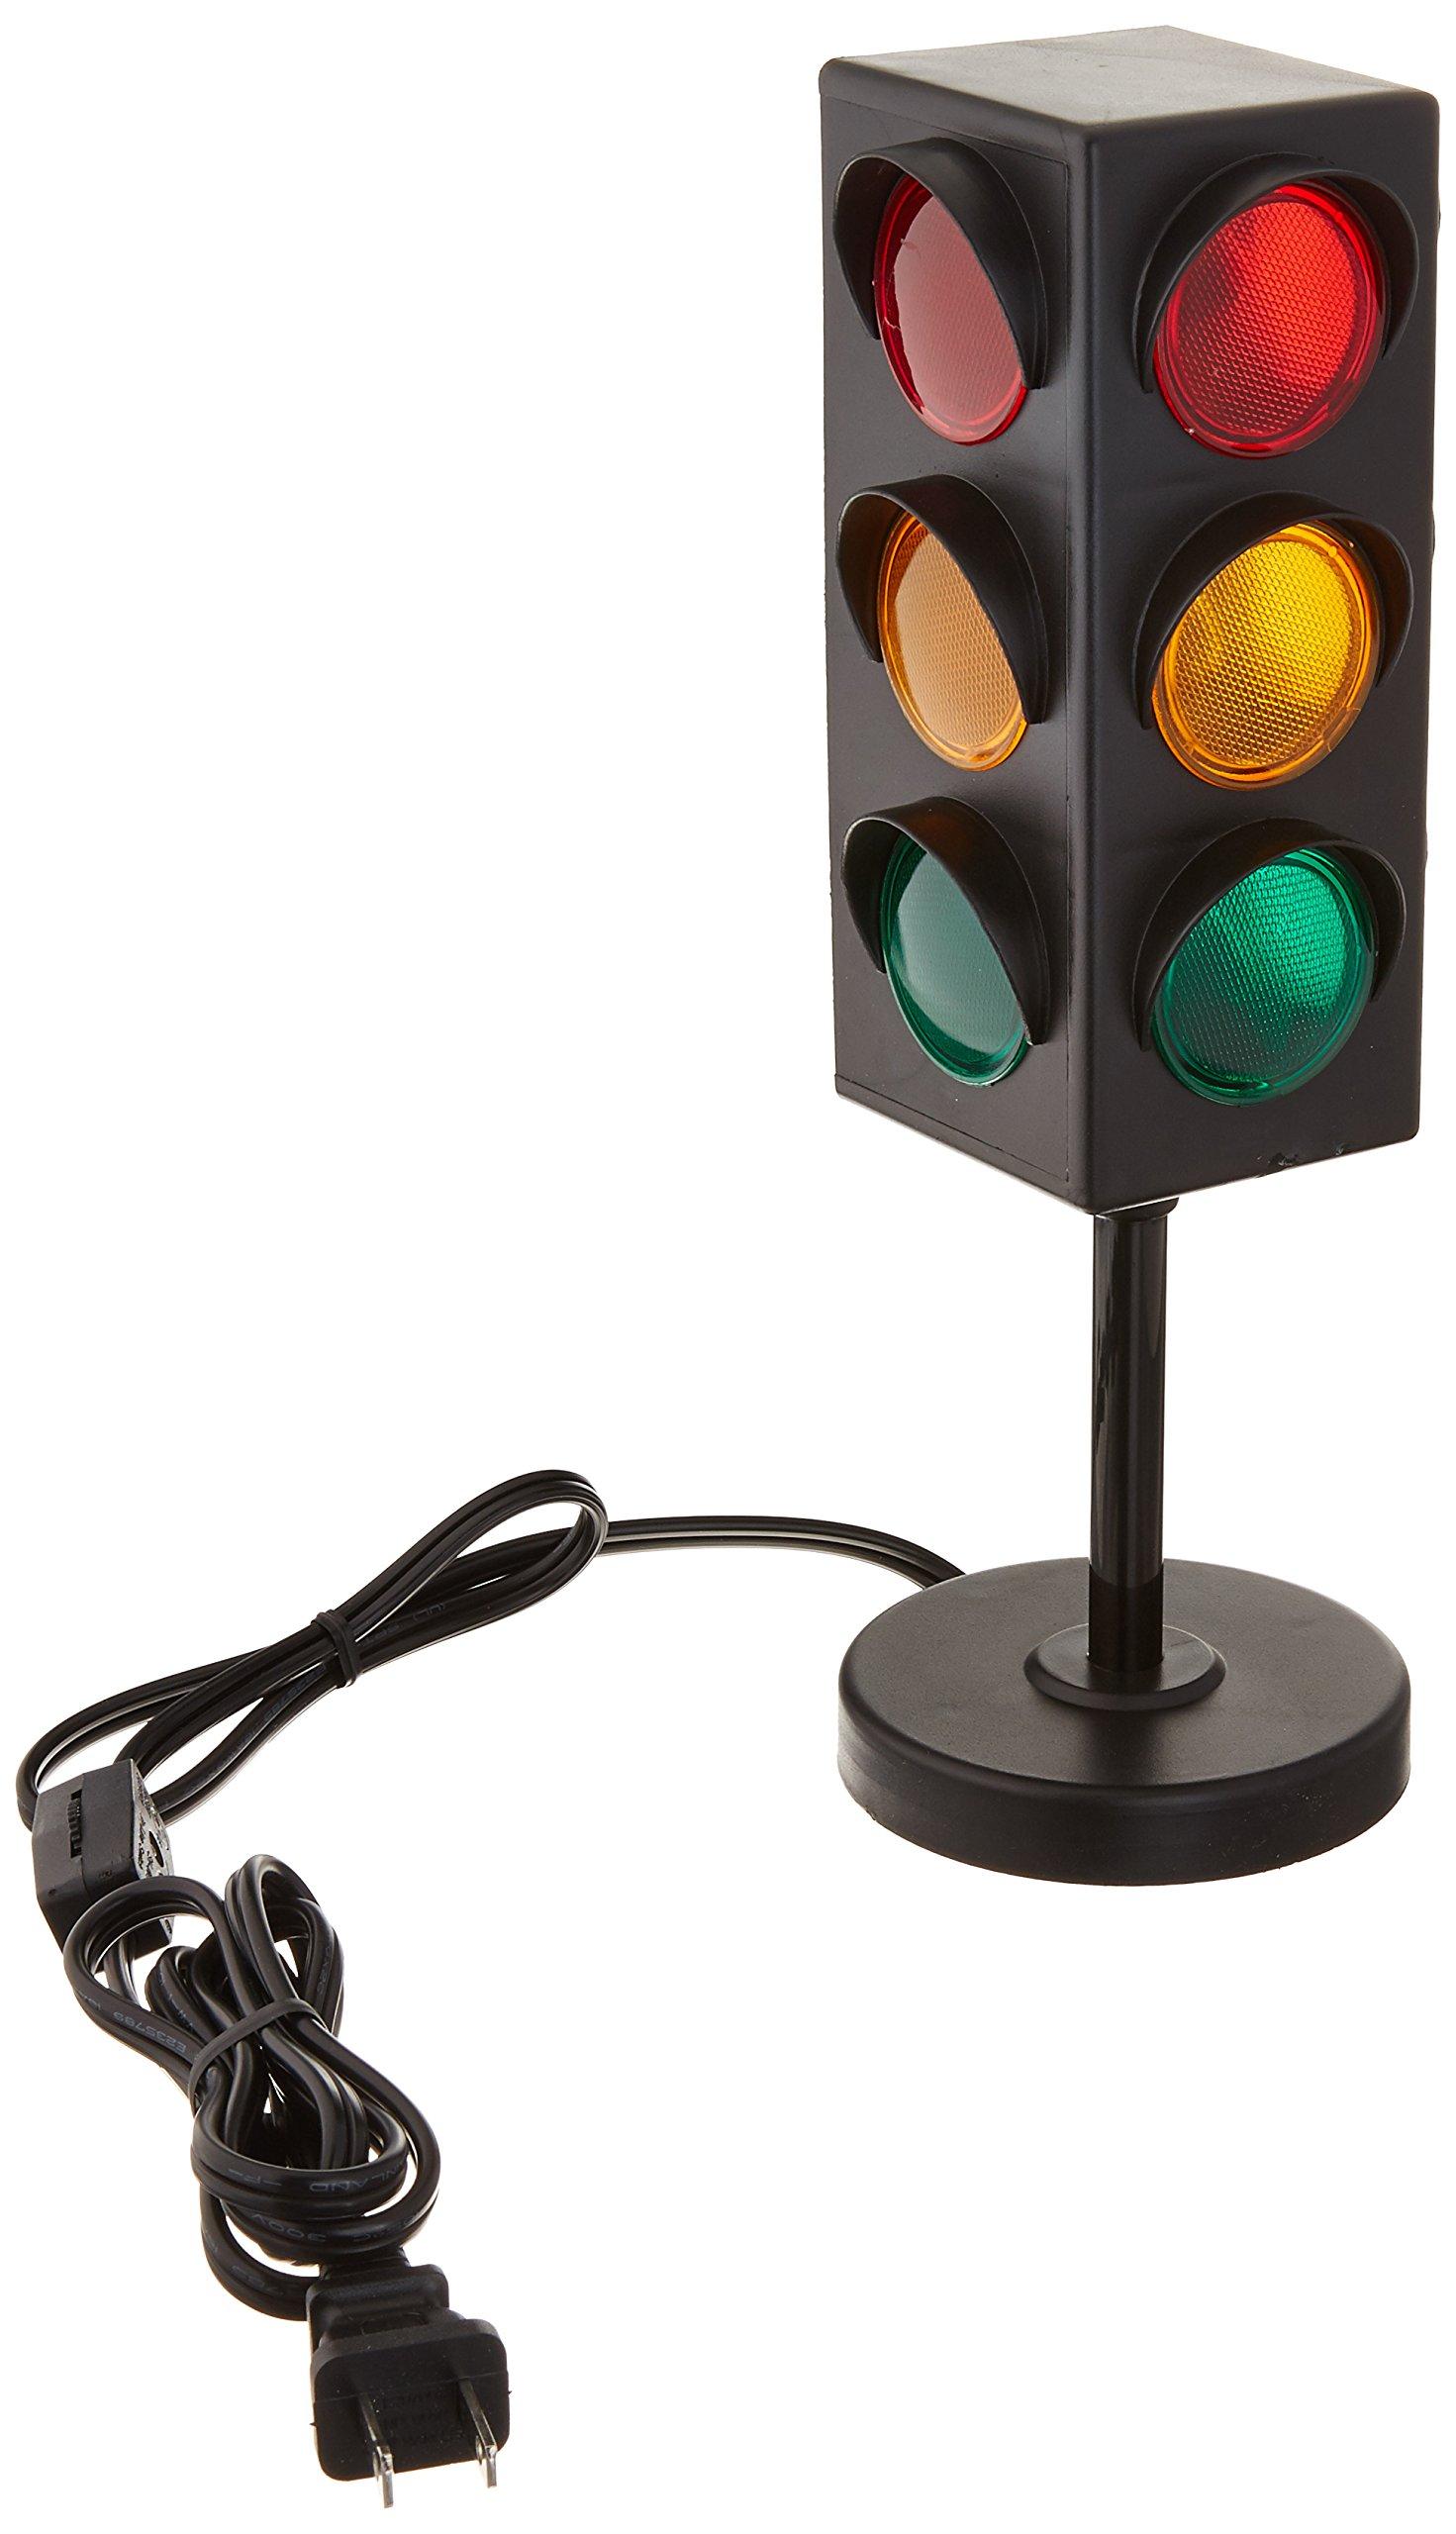 "8"" TRAFFIC LIGHT TABLE LAMP"